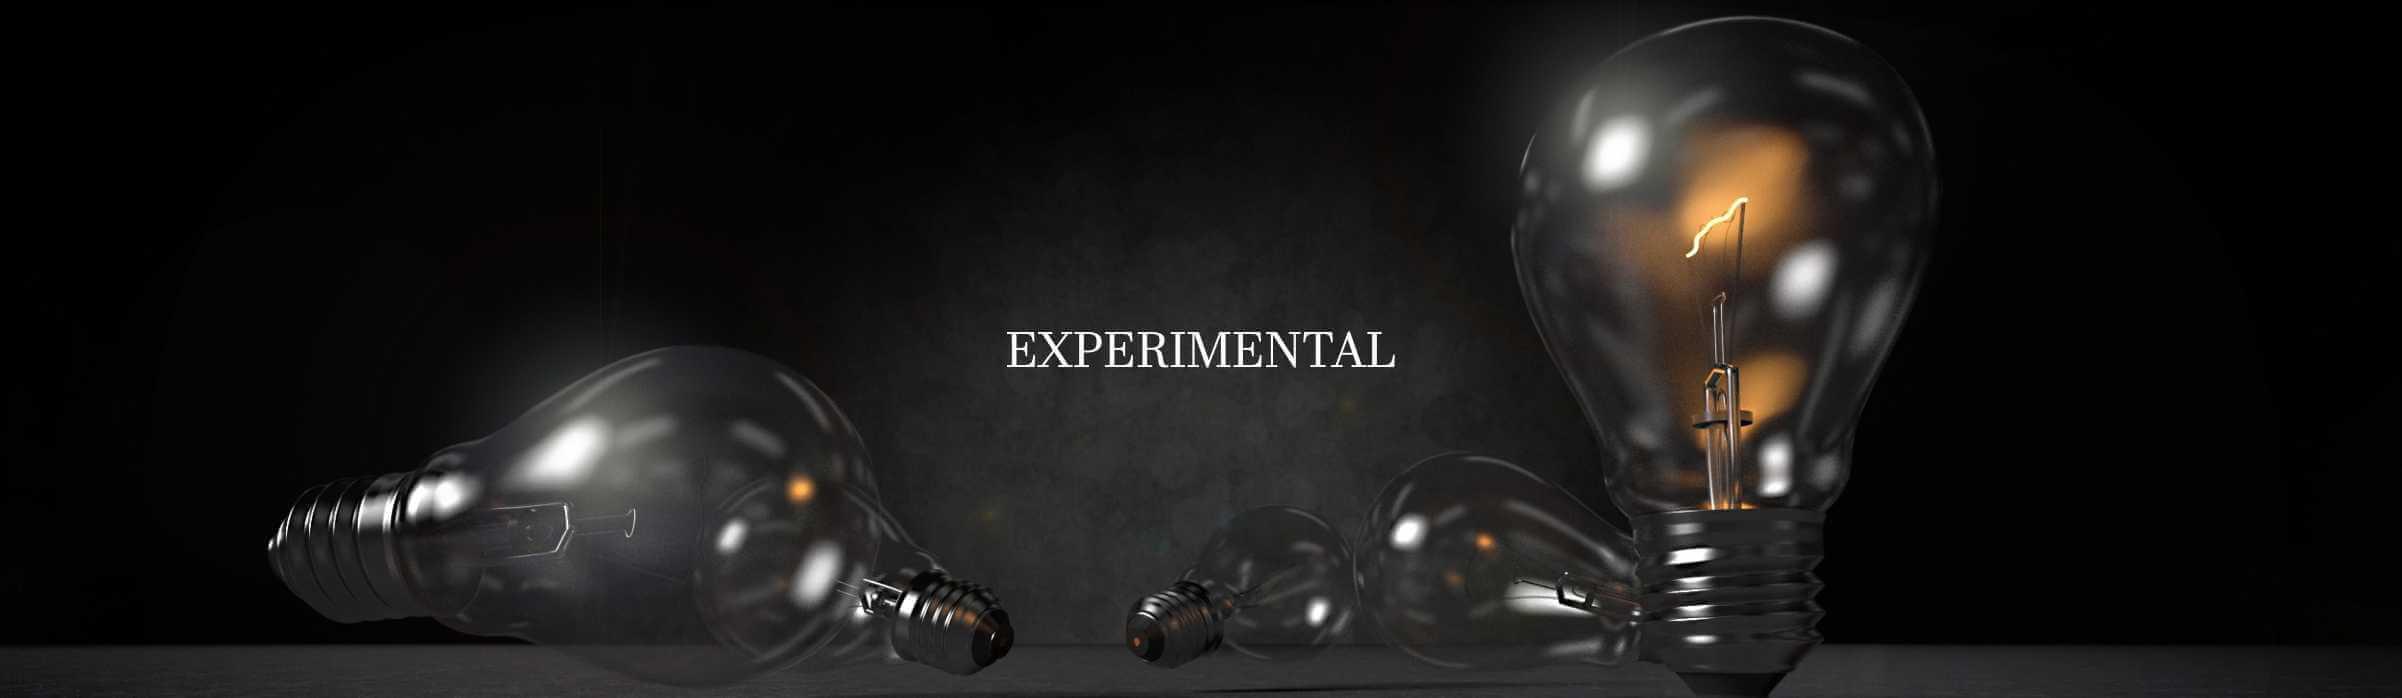 Experemental-2